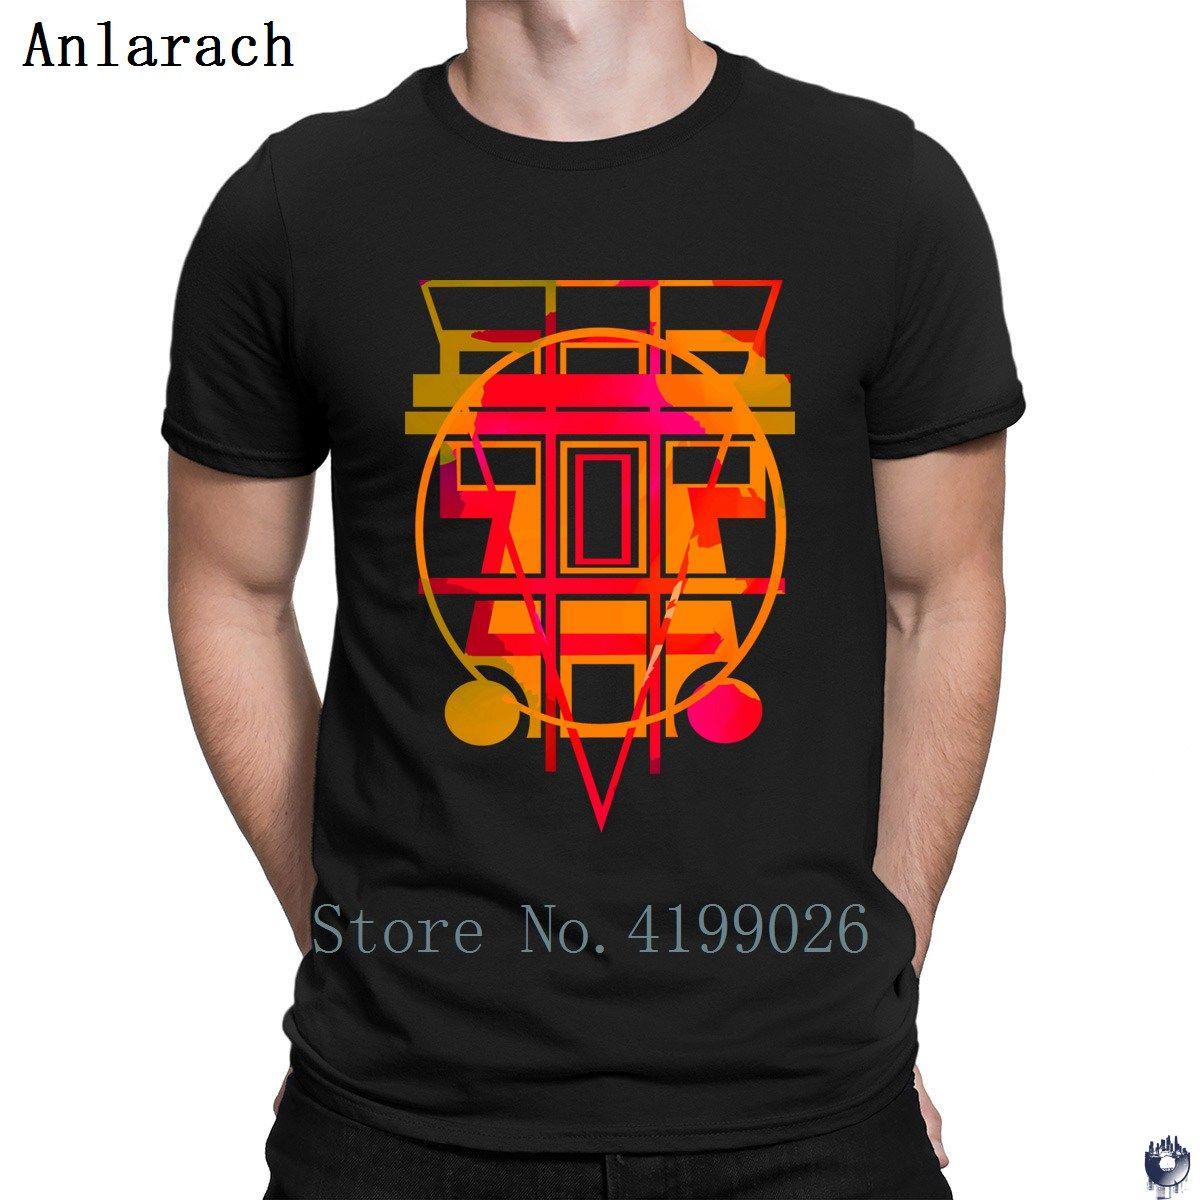 Aztec on Black tshirts Classical Unisex Pattern 100% cotton men's tshirt Interesting summer Character top tee